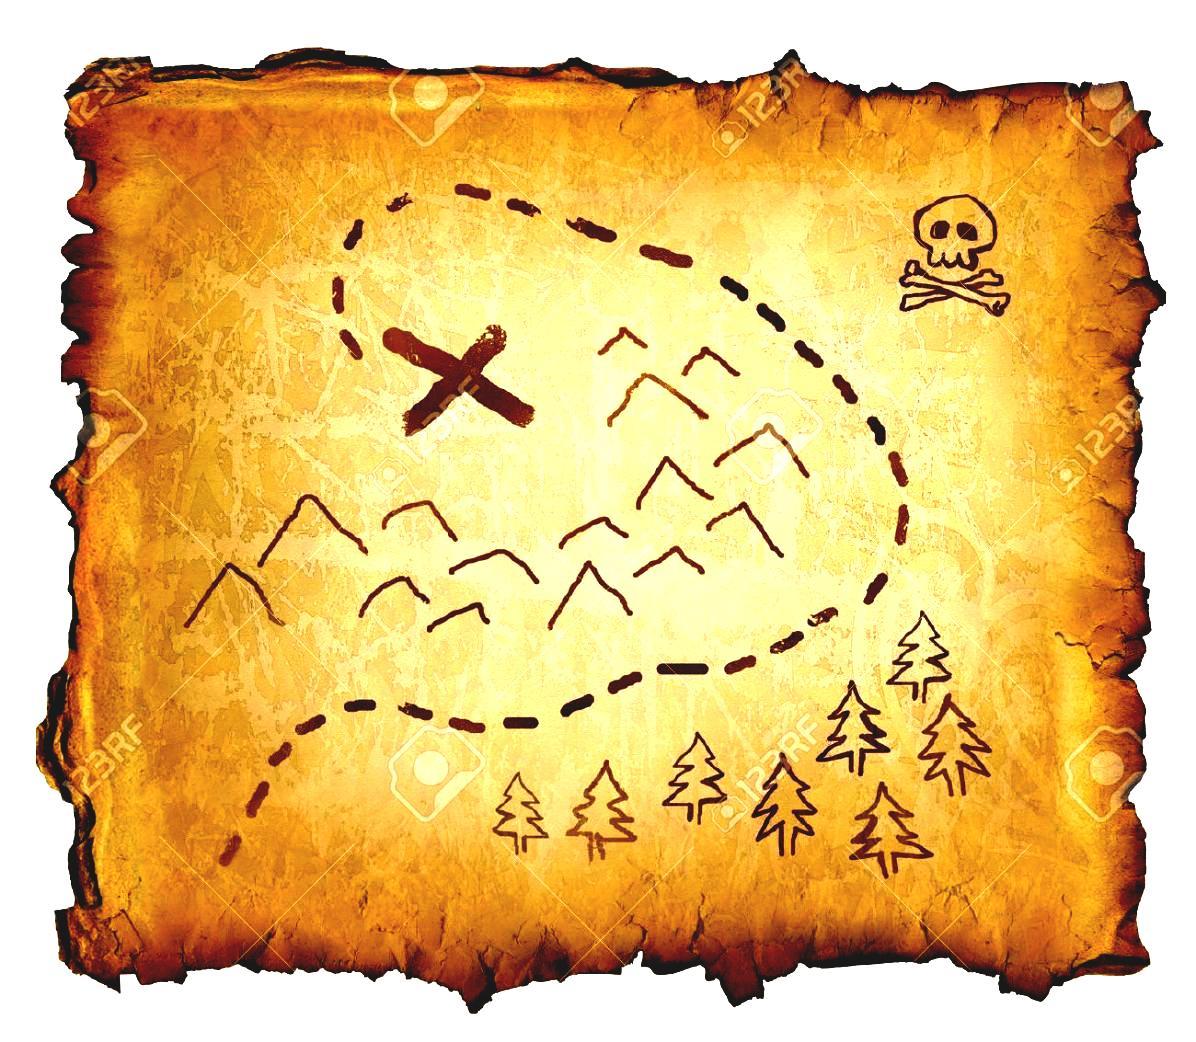 Treasure clipart treasure map Treasure map Map collection island